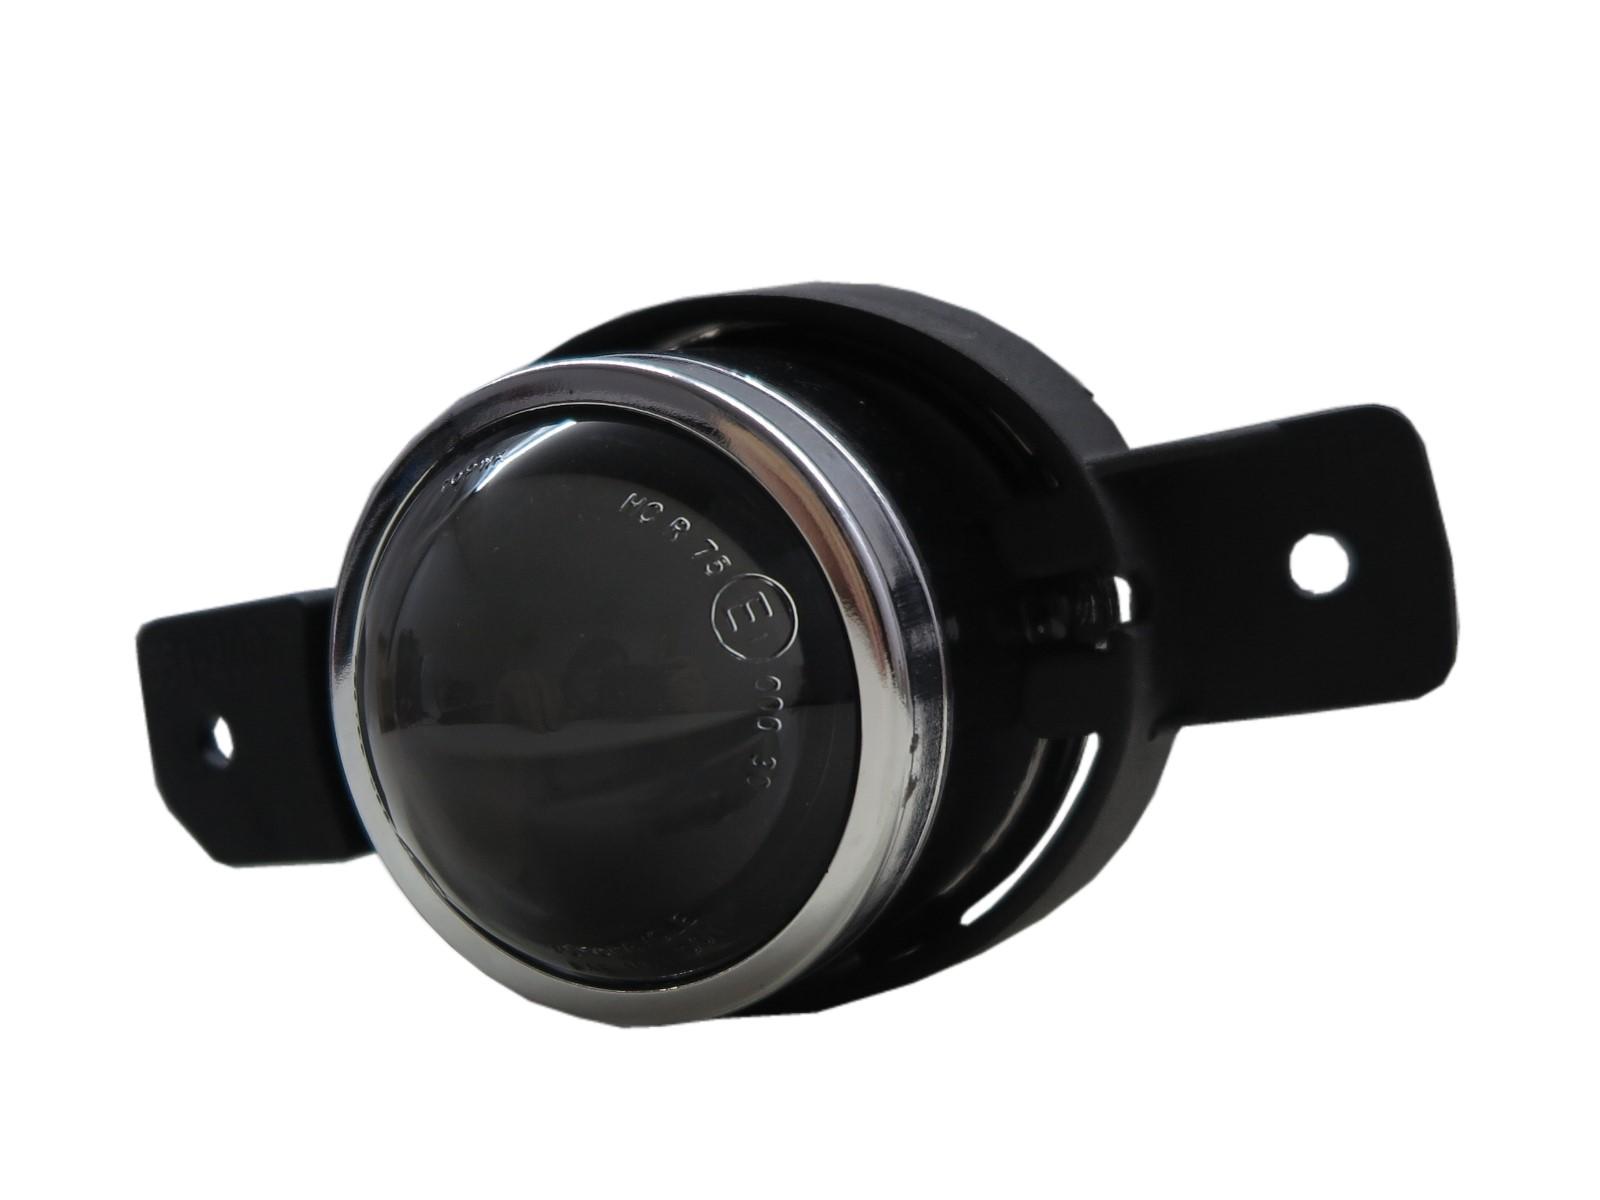 thumbnail 2 - Almera N16 MK2 2002-2006 Facelift 3D/4D/5D Projector Fog Light Black for NISSAN